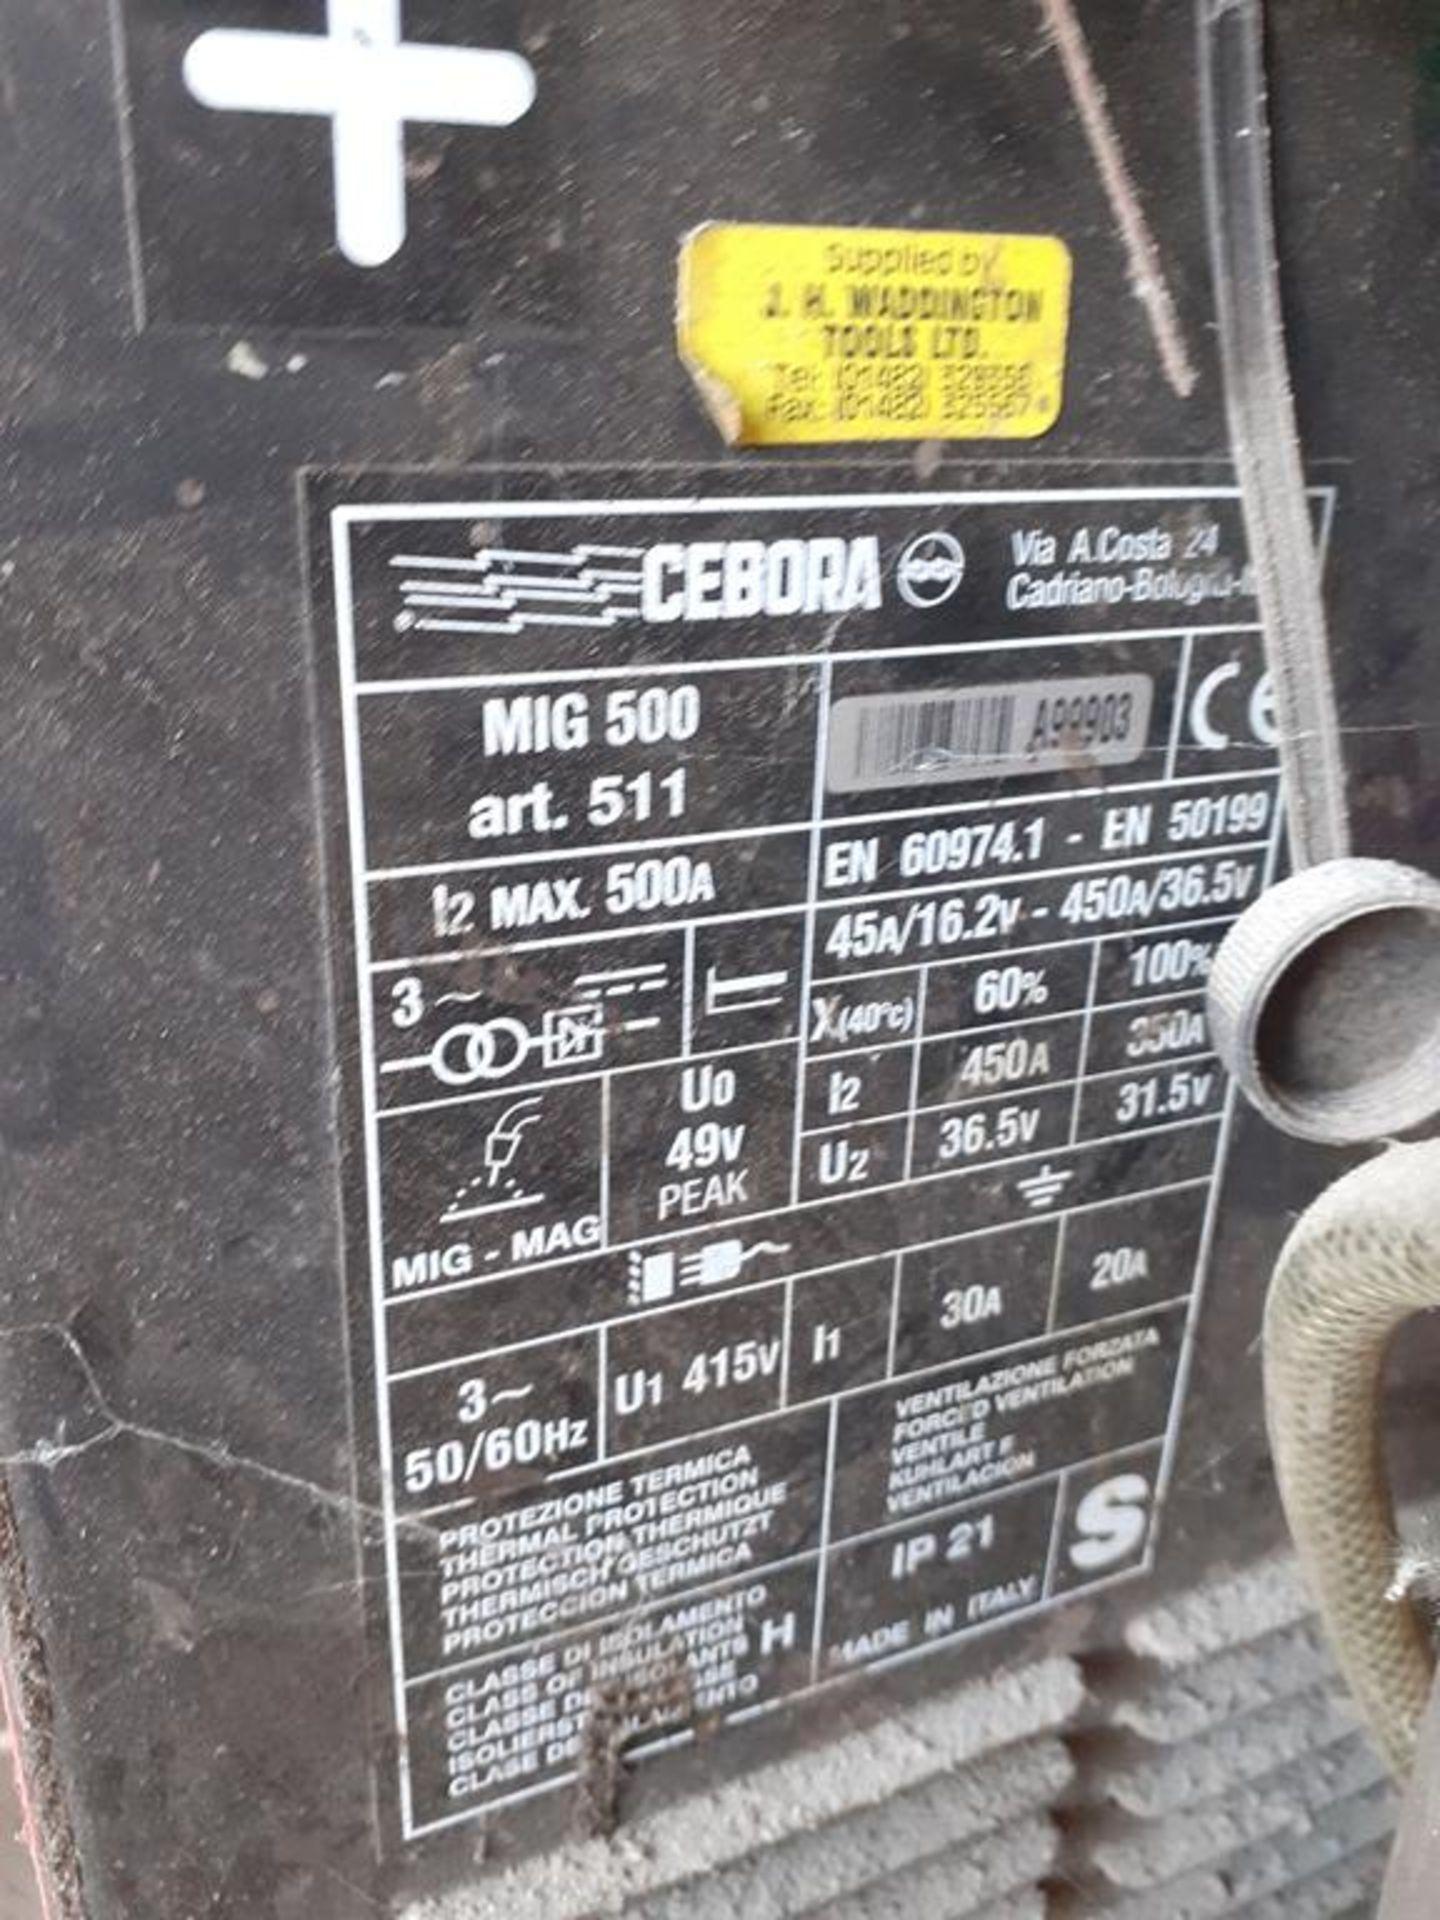 Cebora MIG 500 Mig welder - Image 2 of 2